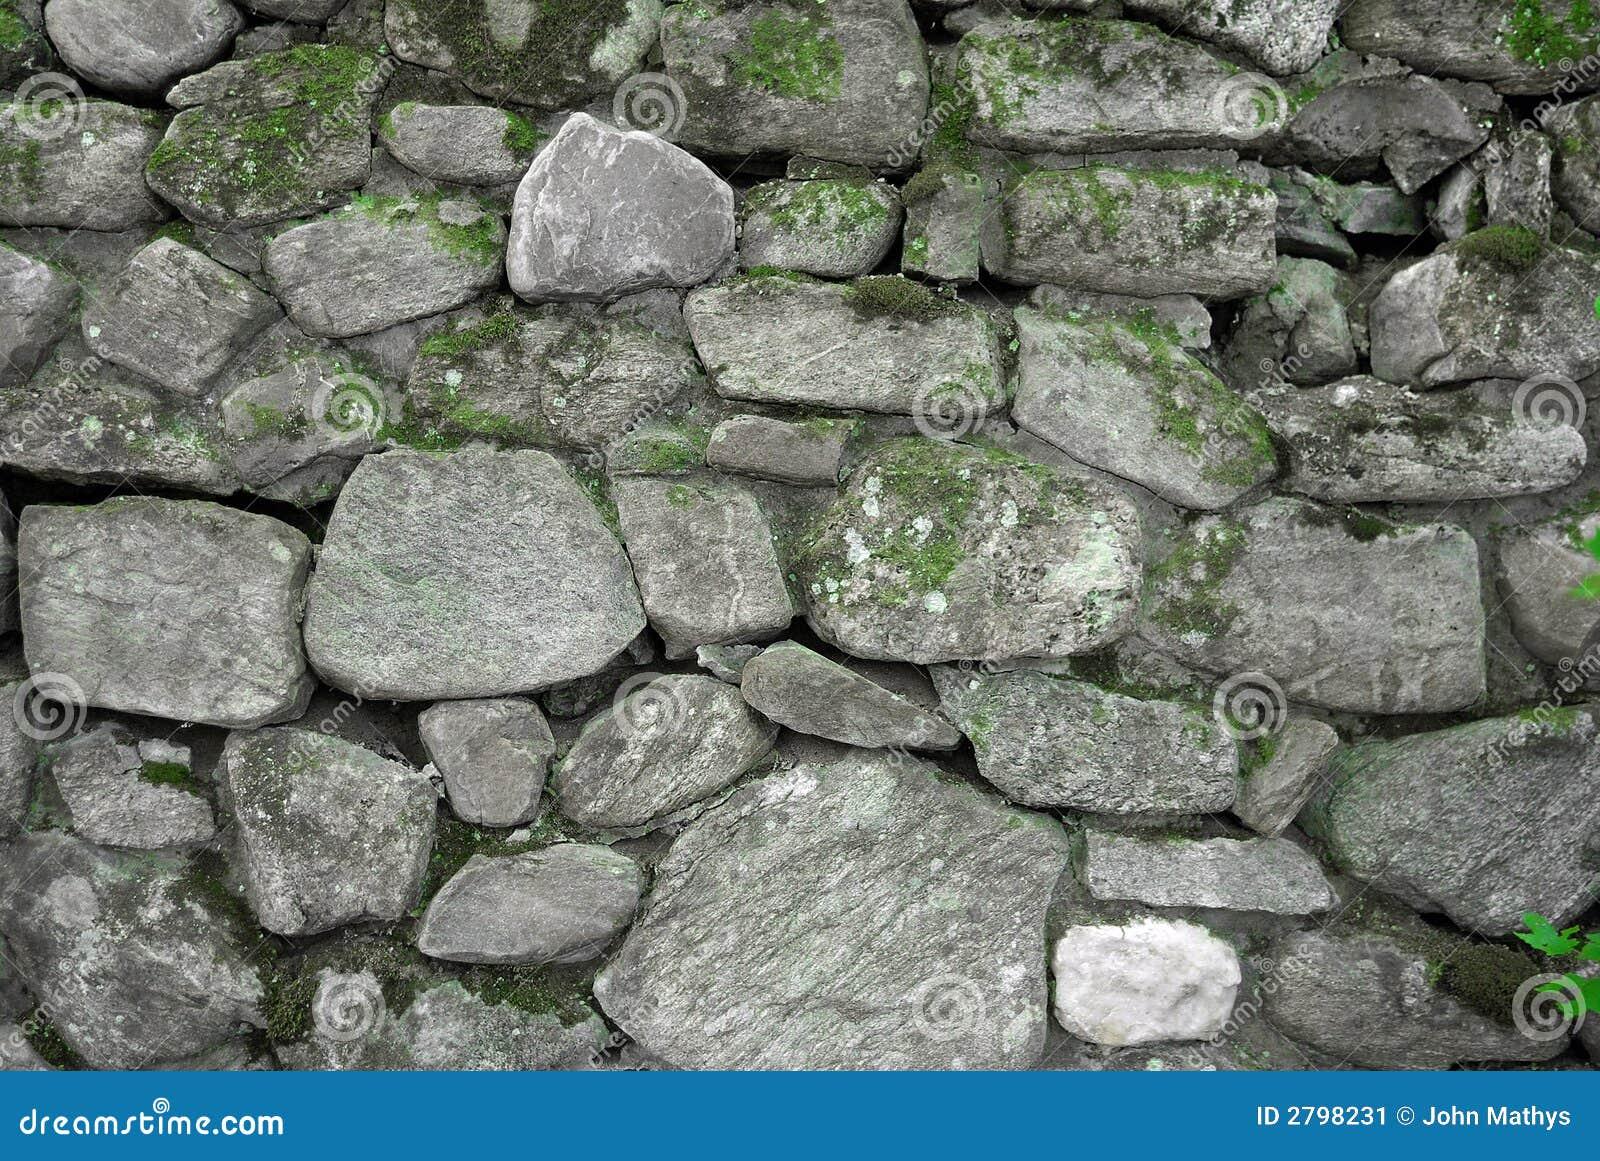 grey and green rock wall stock image image of vegetation 2798231. Black Bedroom Furniture Sets. Home Design Ideas